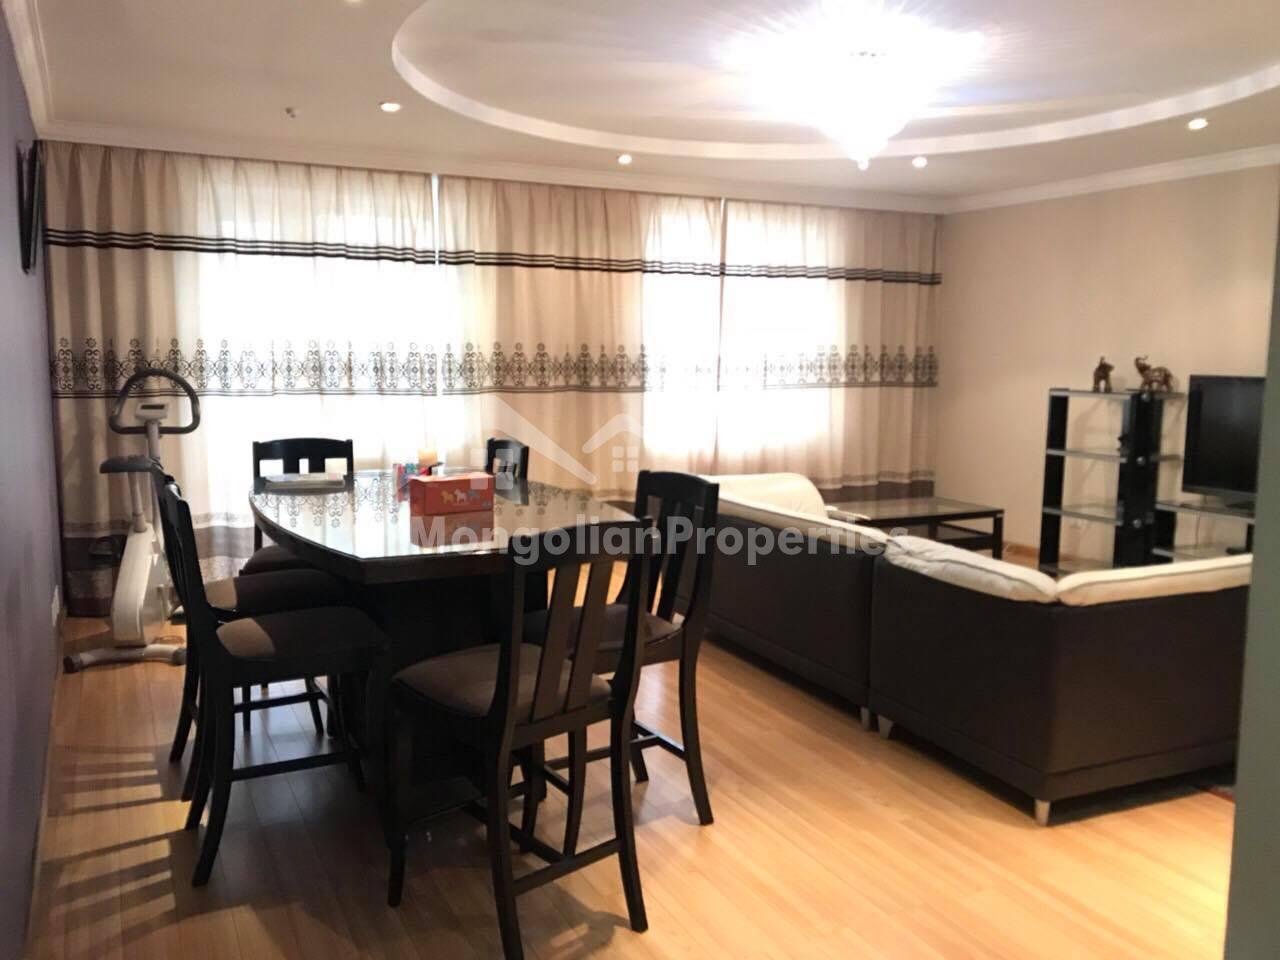 2 BEDROOM APARTMENT FOR RENT IN JARGALAN TOWN